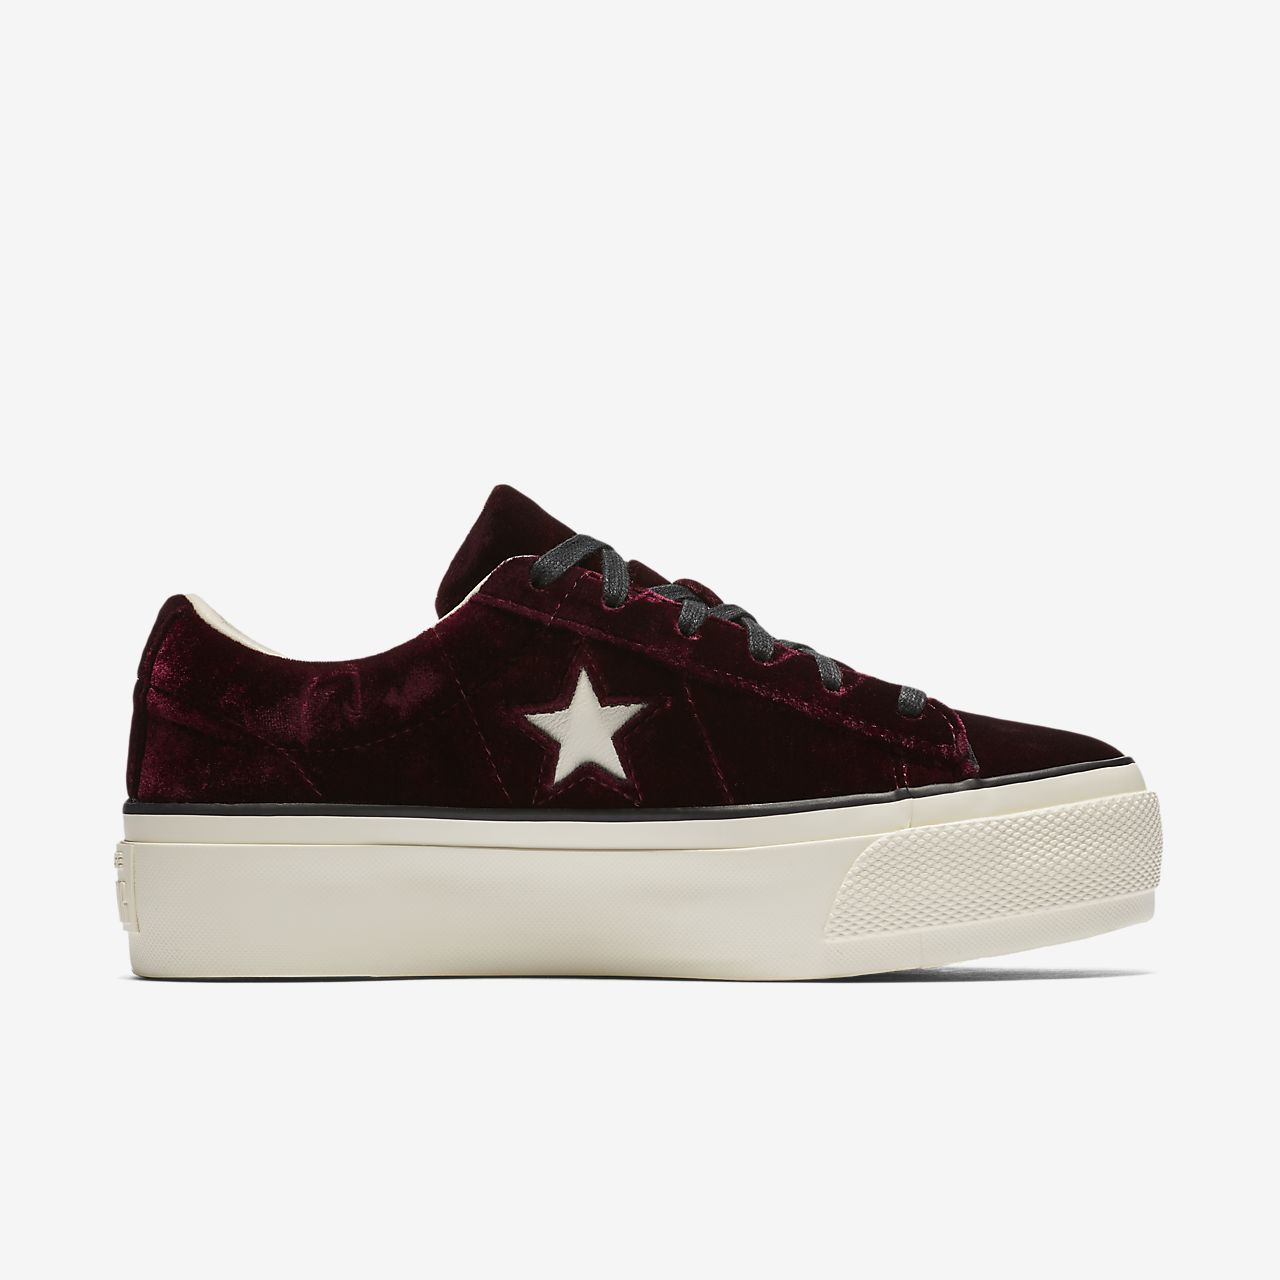 converse one star brown